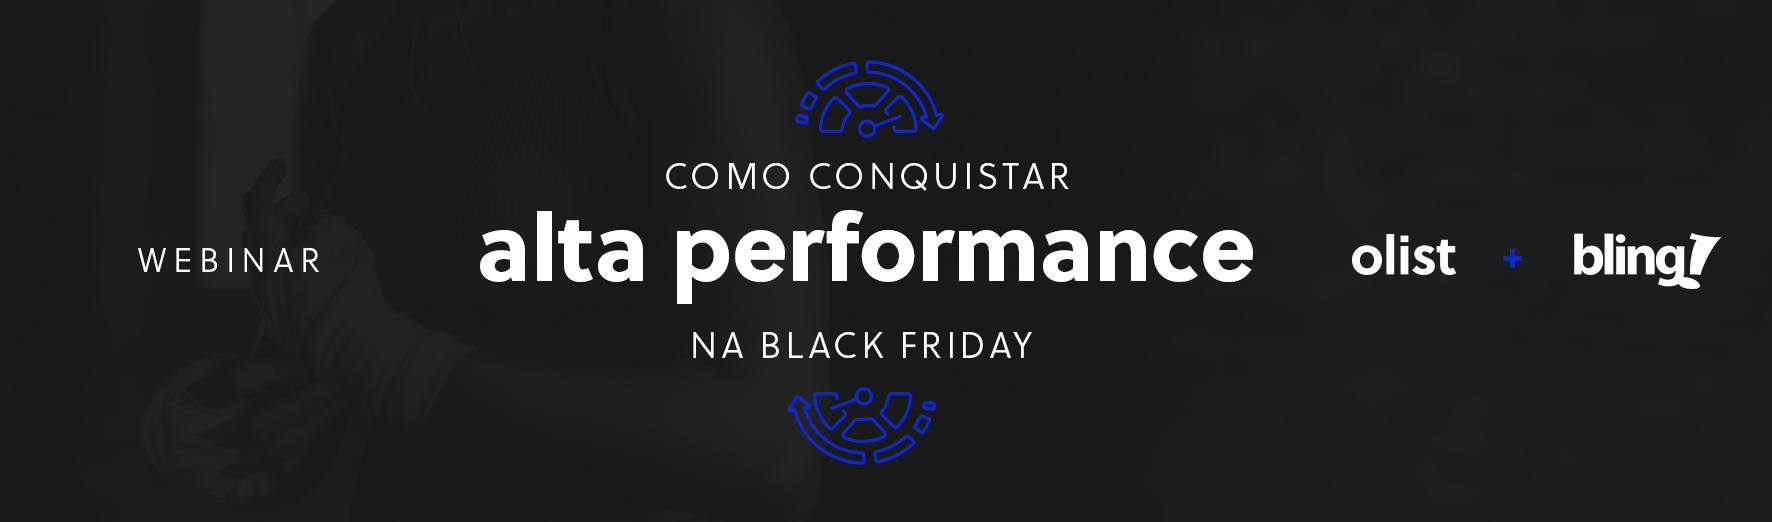 [Olist+Bling] Descubra como conquistar alta performance na Black Friday